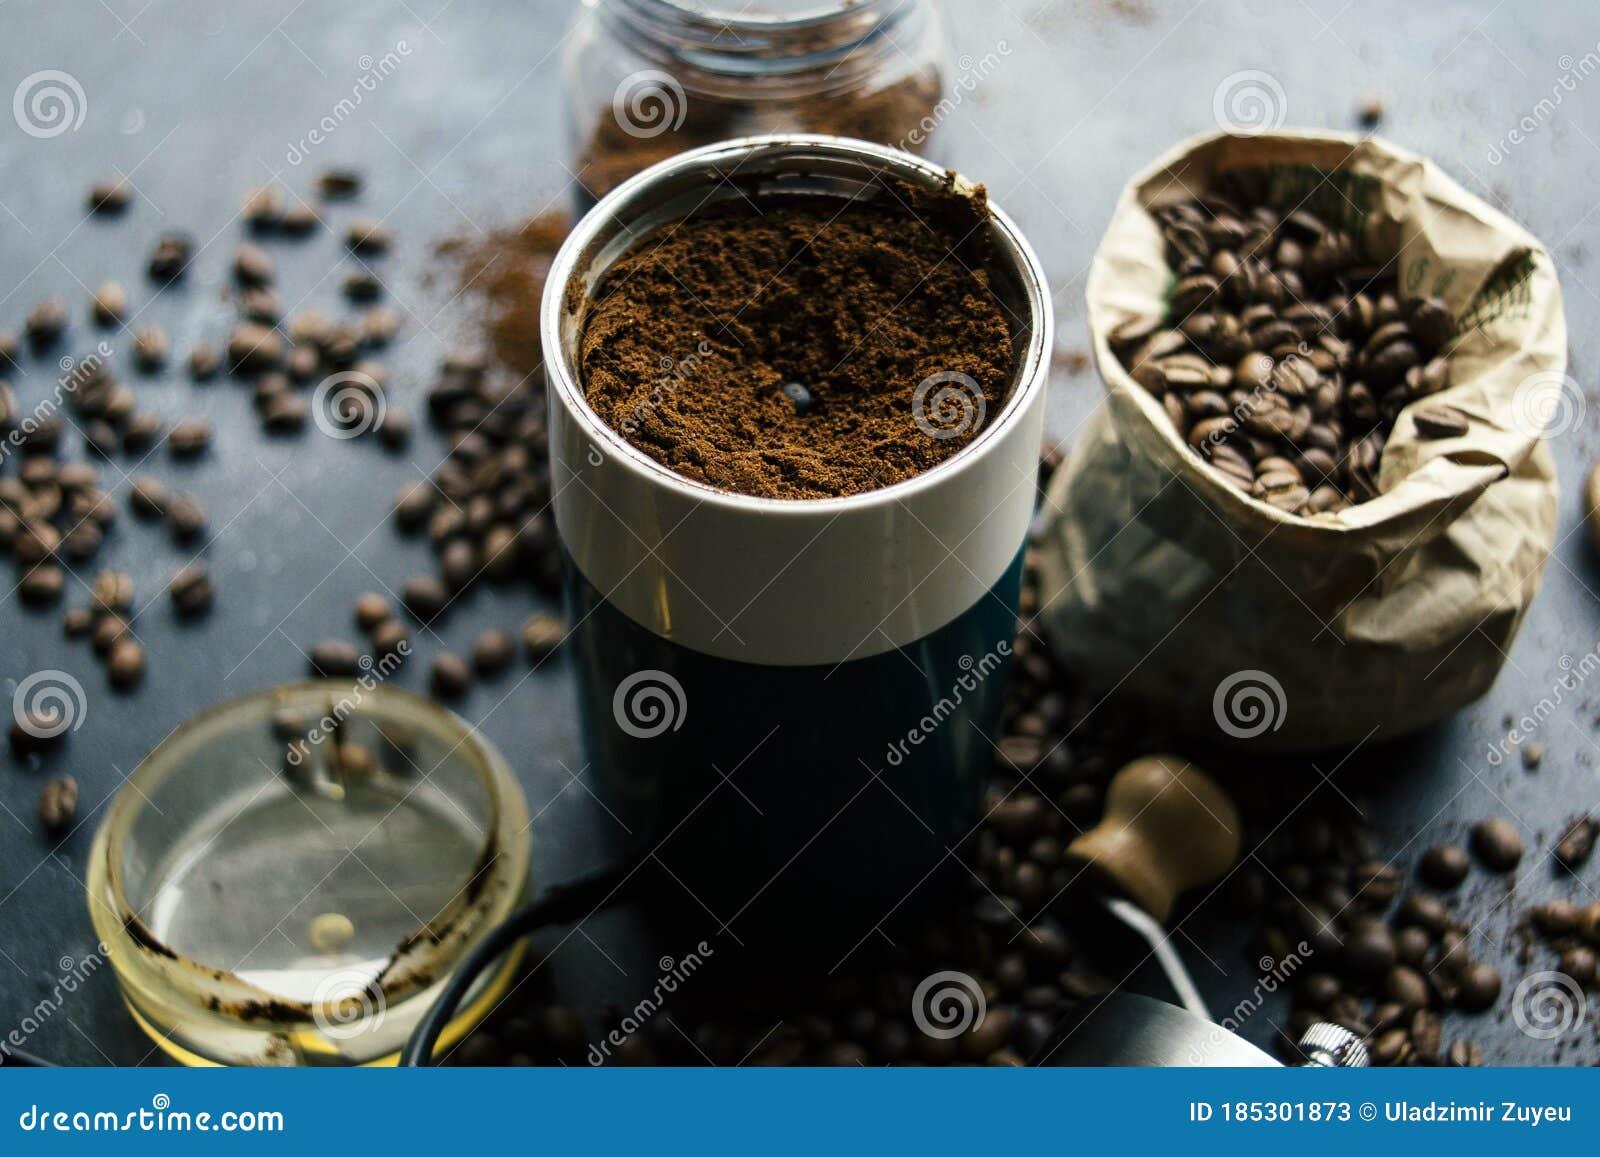 Blend Espresso Hipster Coffee Specialty Barista Machine Pour Process Black Restaurant Shop Beans Blender Grinder Stock Image Image Of Blender Industrial 185301873